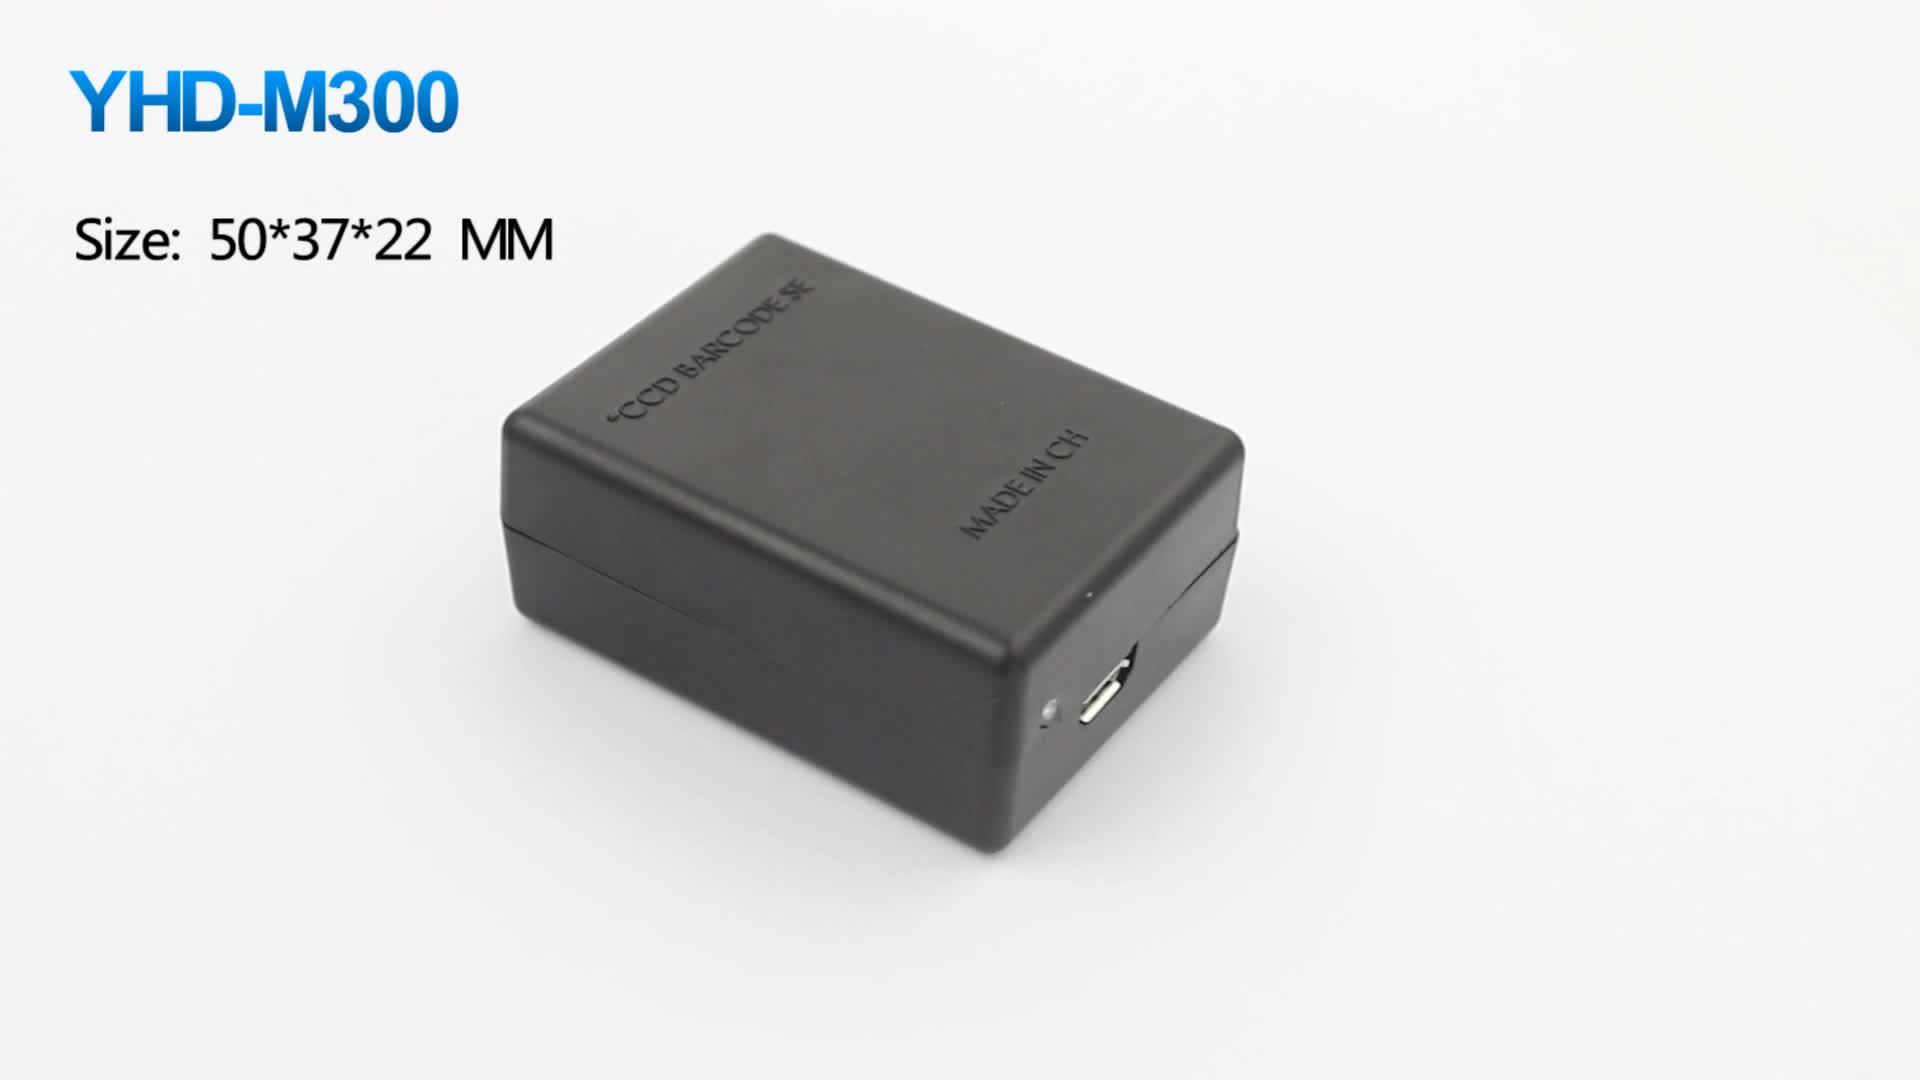 1D 2D QR Barcode Scanner Module Engine Embedded CCD Fixed Bar Code Reader Module for Kiosk RS232 USB Interface OEM ODM